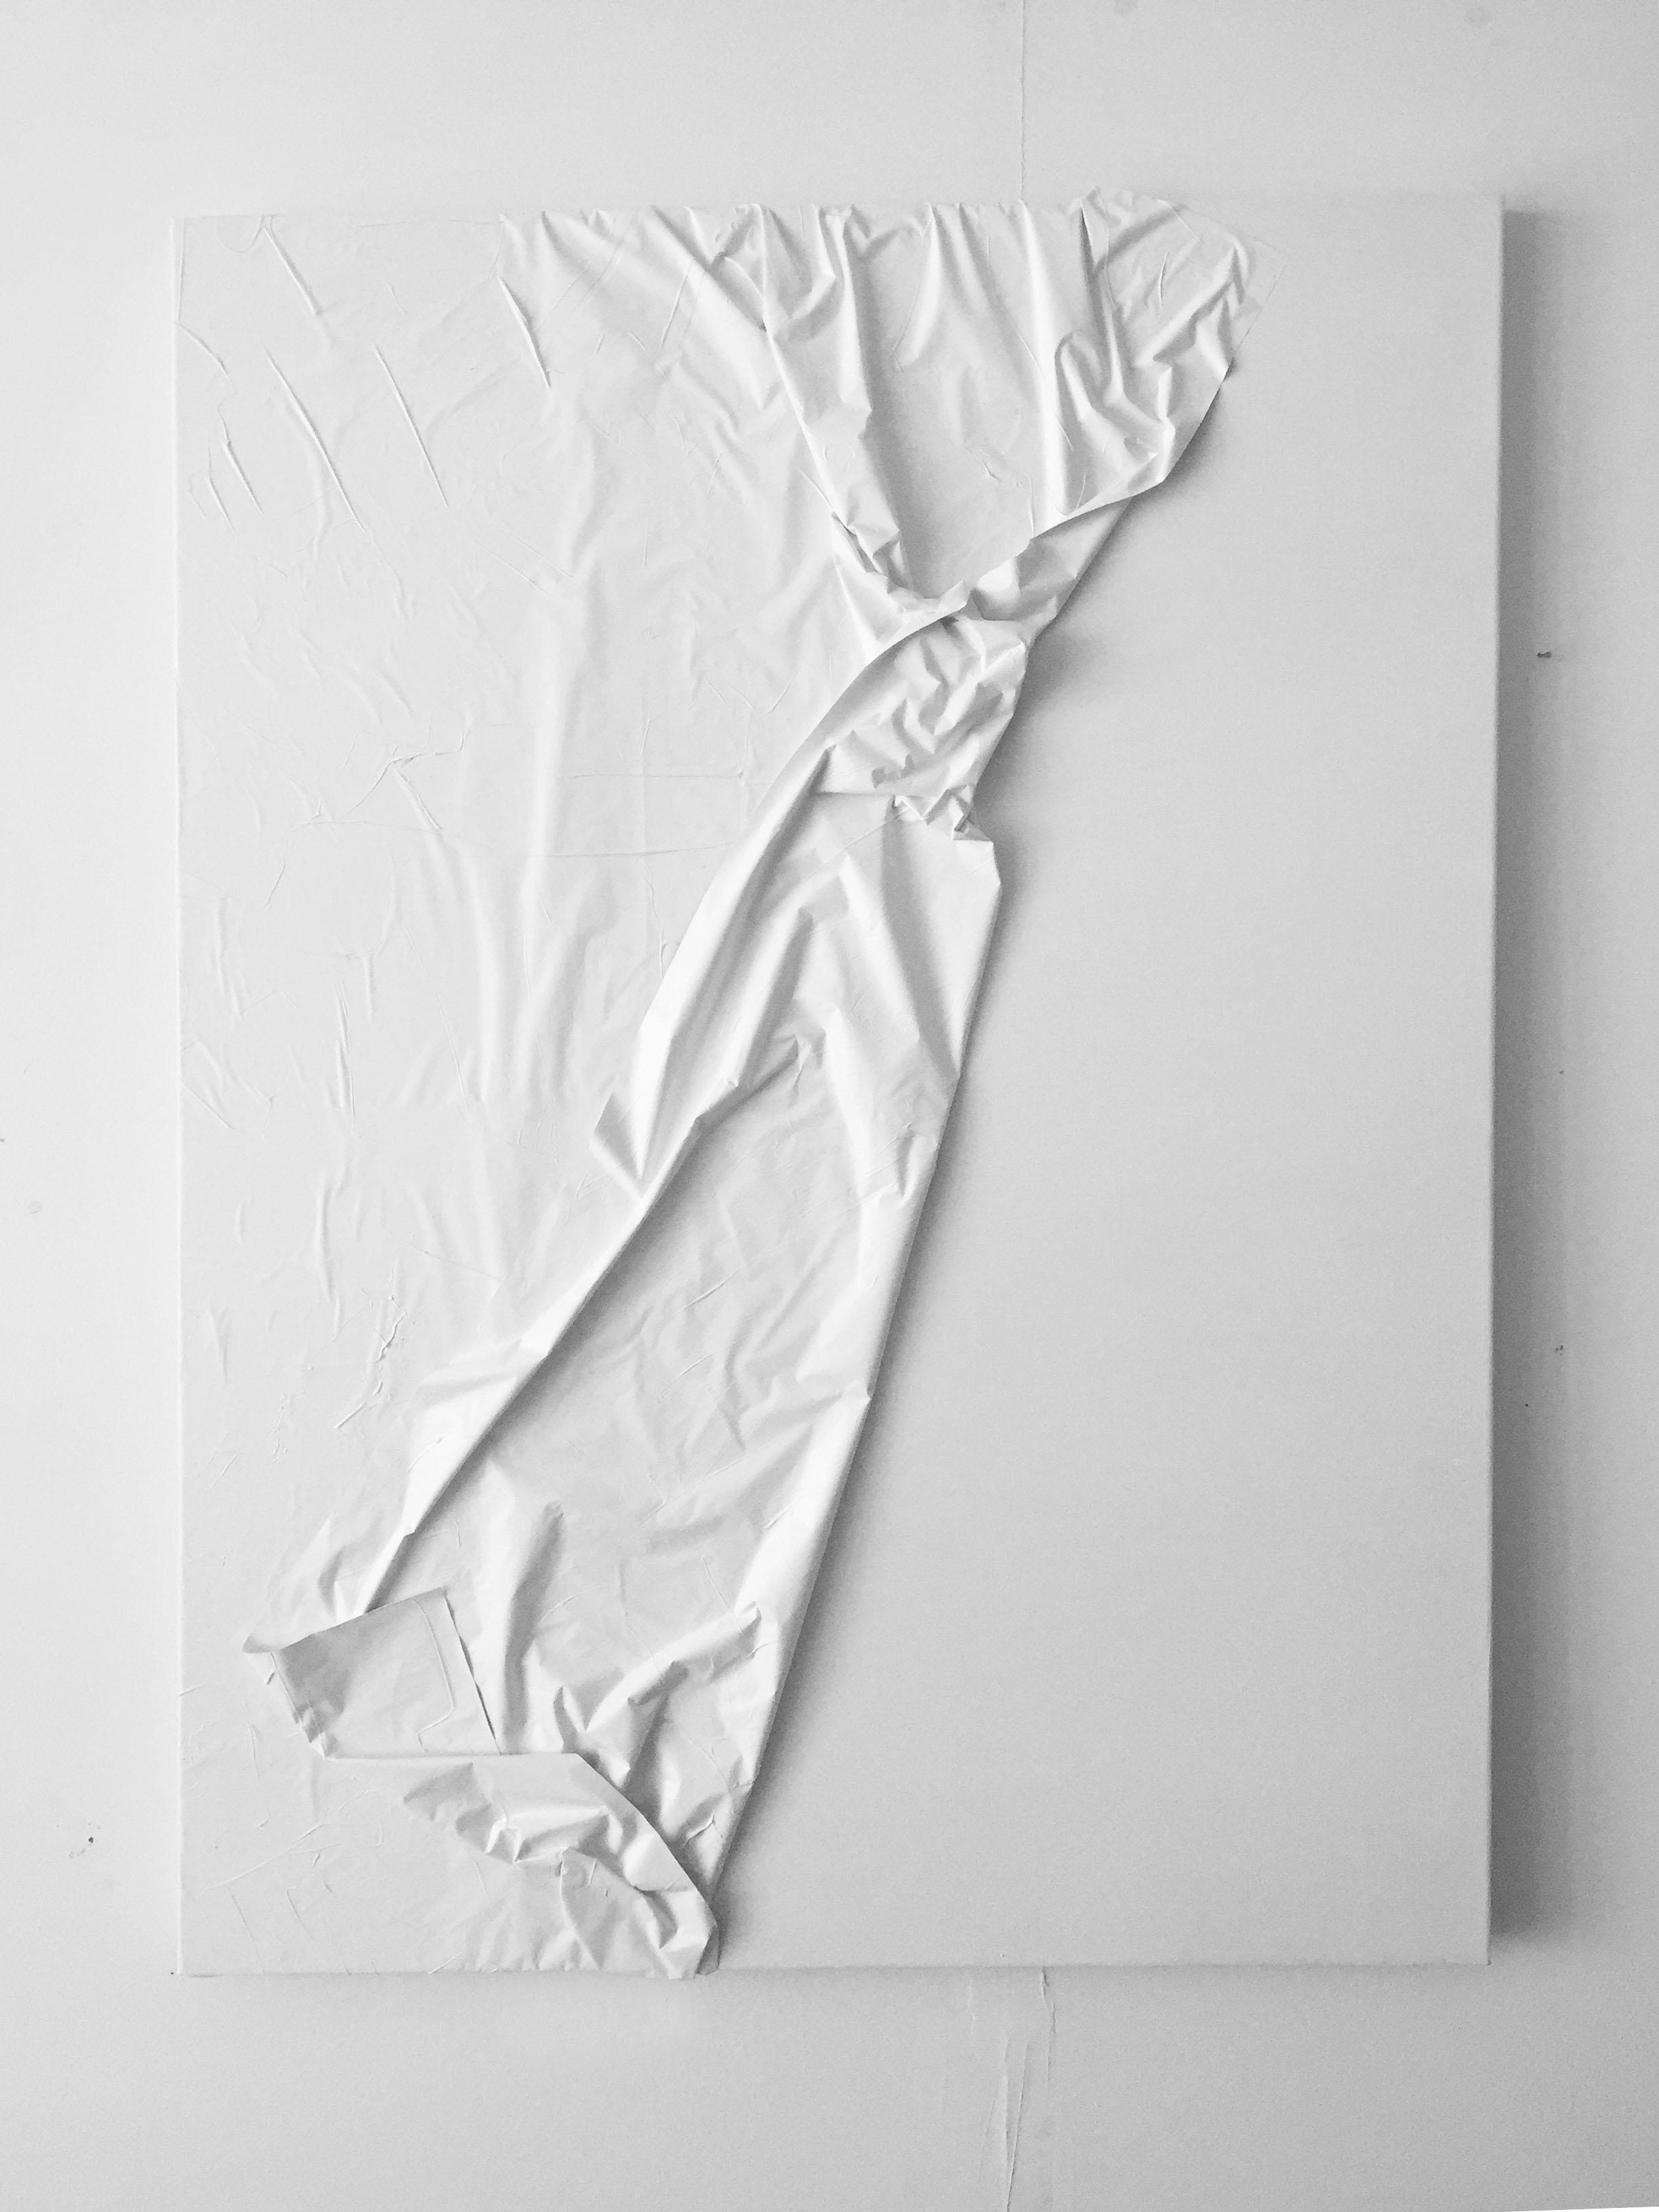 74' 11'' PW6 (Xii) AA Prueba de Leucofobia: Blanco sobre Blanco (2018) - Alberto Gil Cásedas